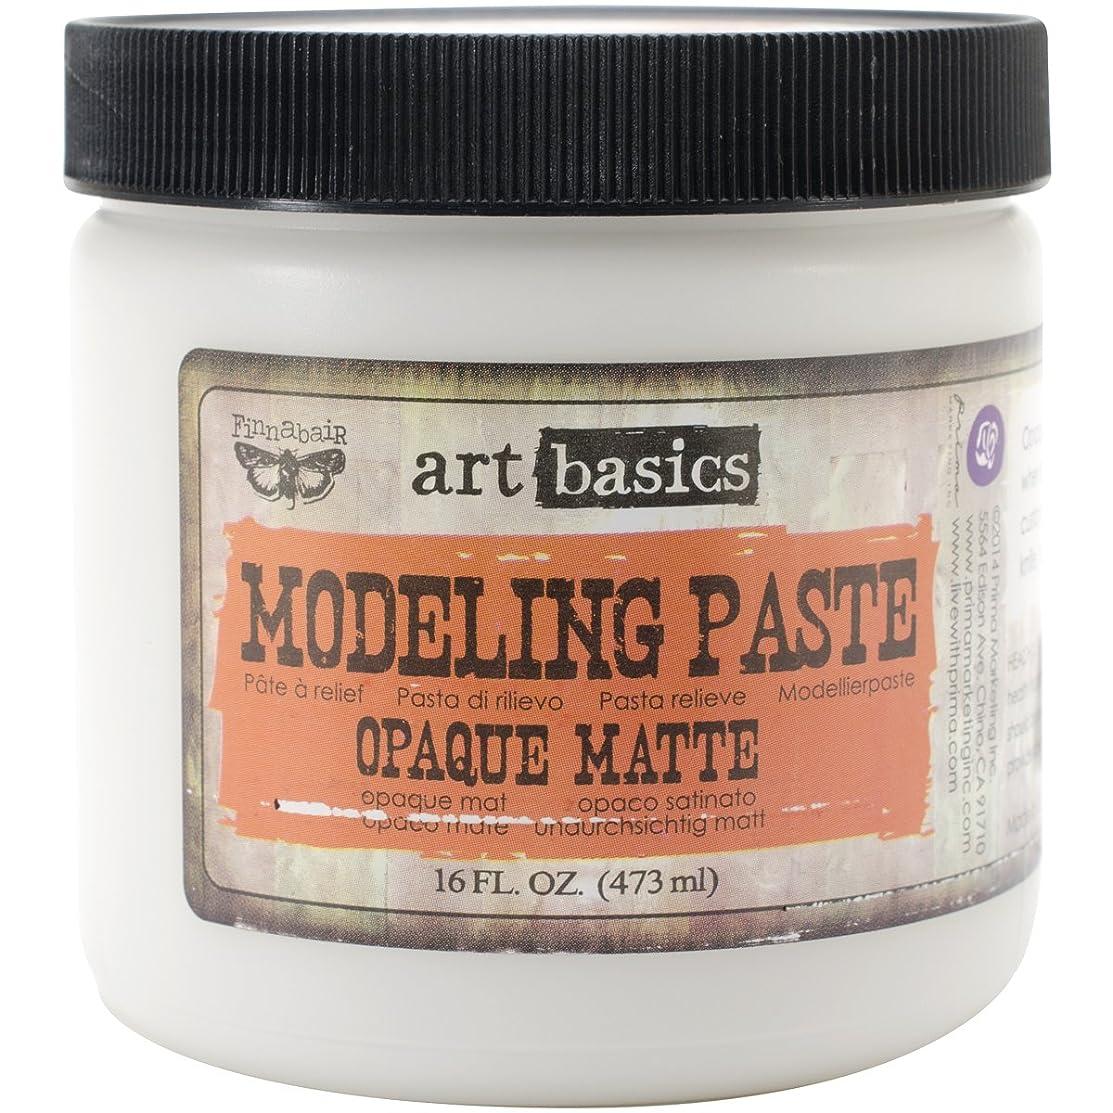 Prima Marketing 961350 Art Basics Modeling Paste 1, 6-Ounce, Opaque Matte